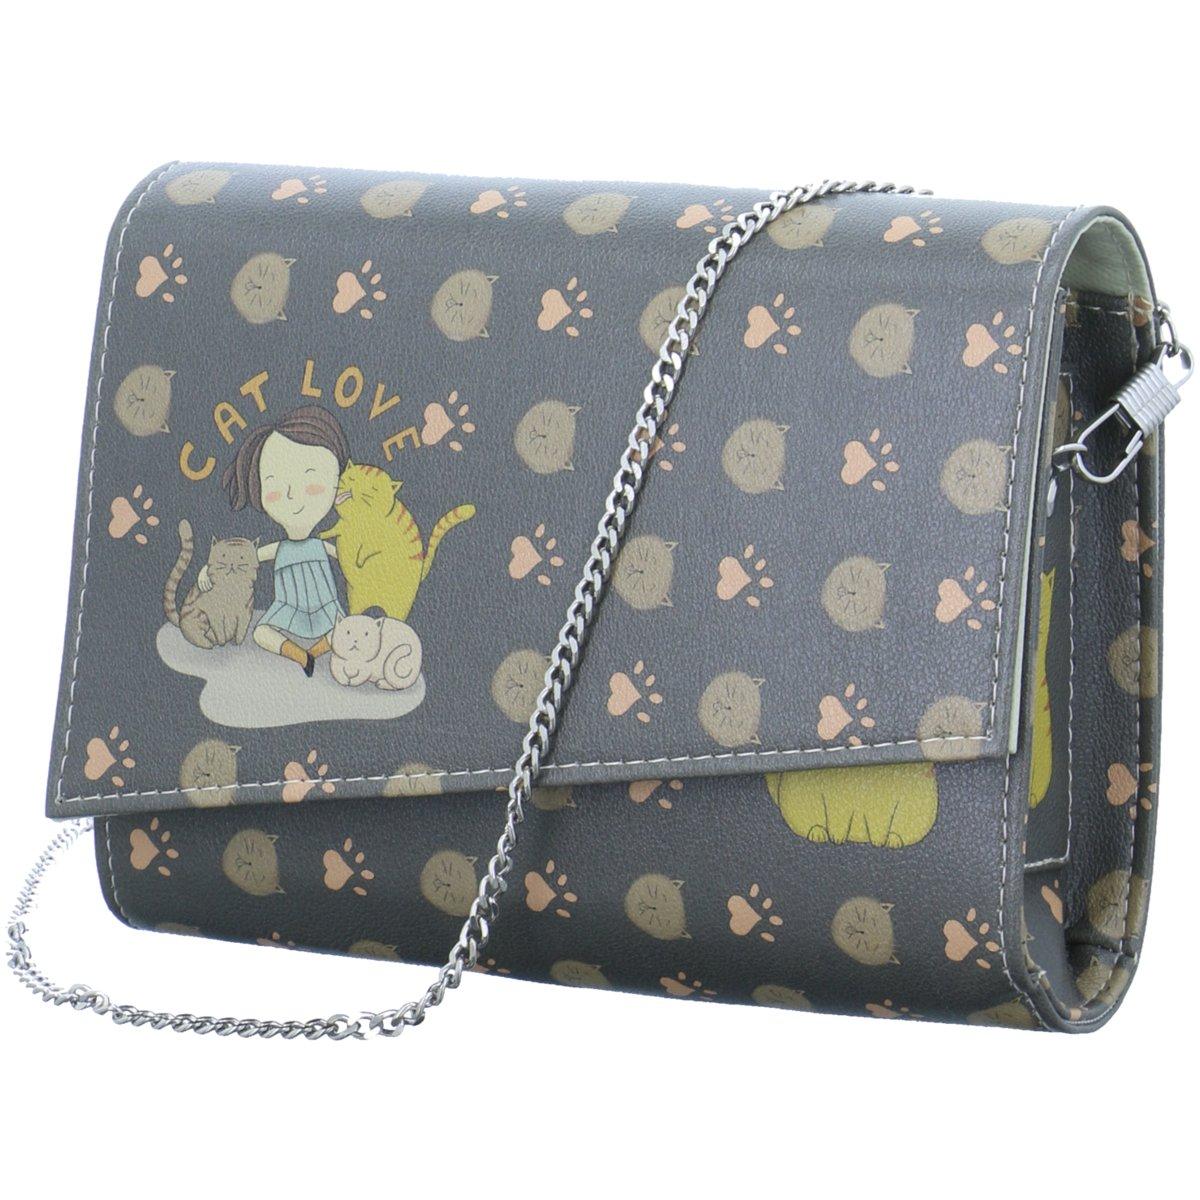 Schuhe X Taschen Cat Clutch Dogo Blau Love 357946 Accessoires SEYqaSxwd